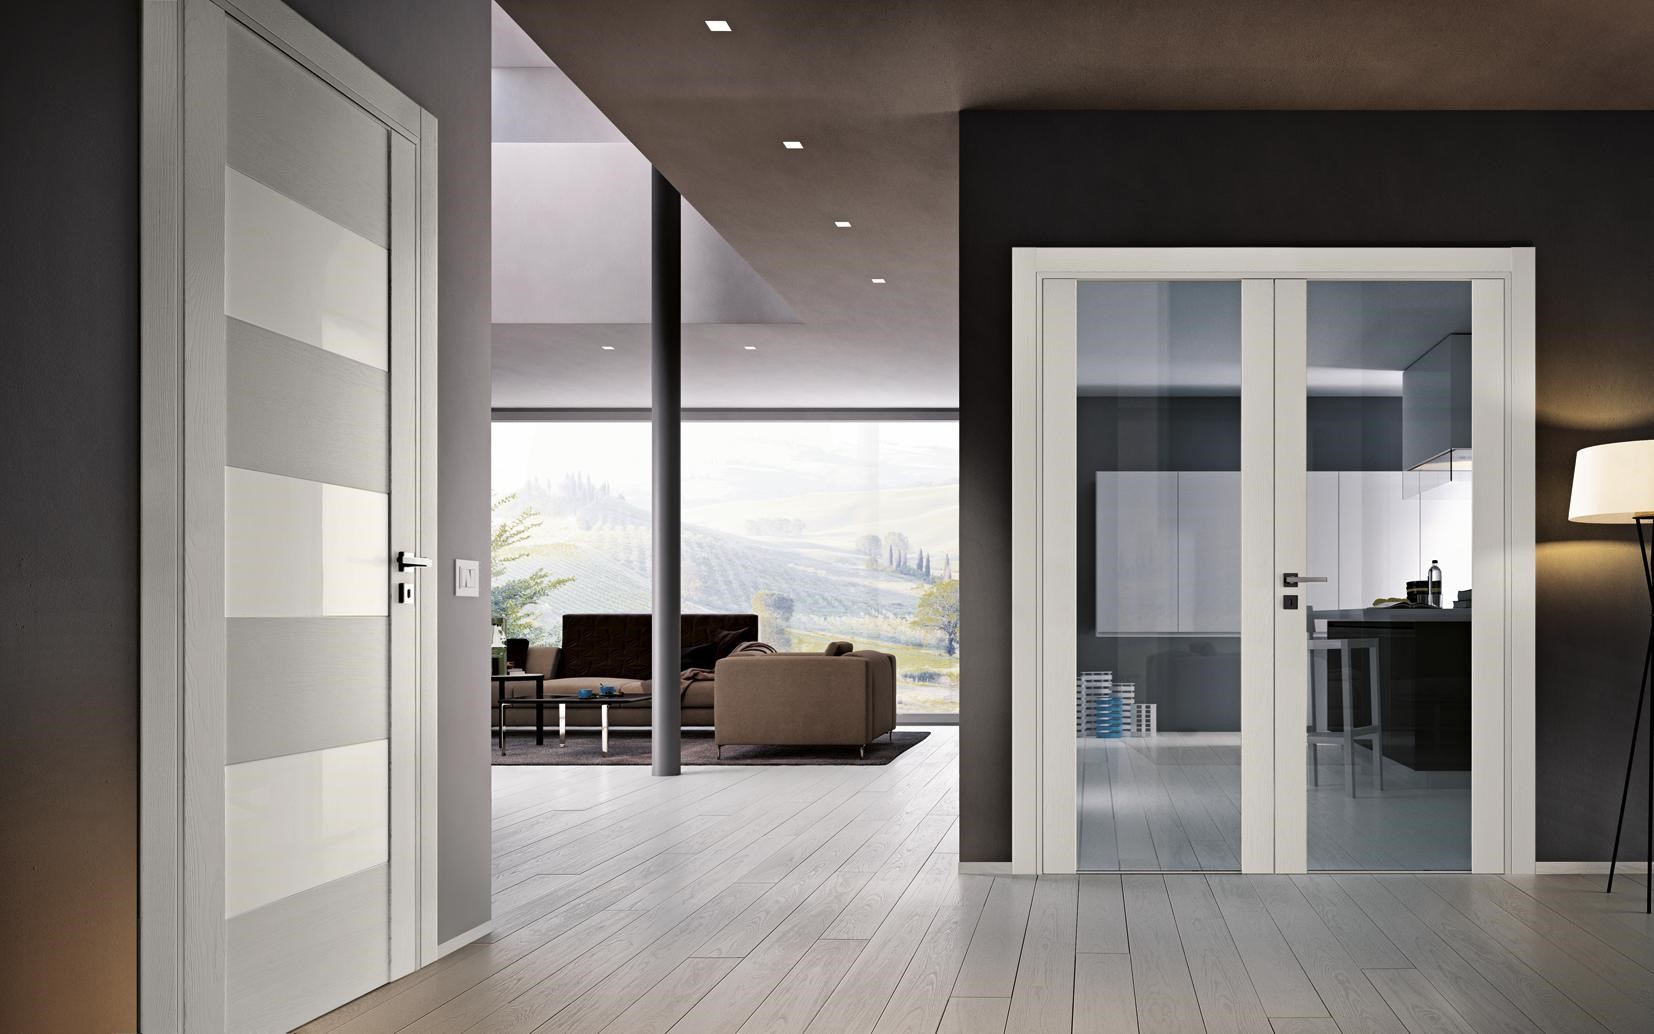 белые двери в интерьере квартиры фото нам